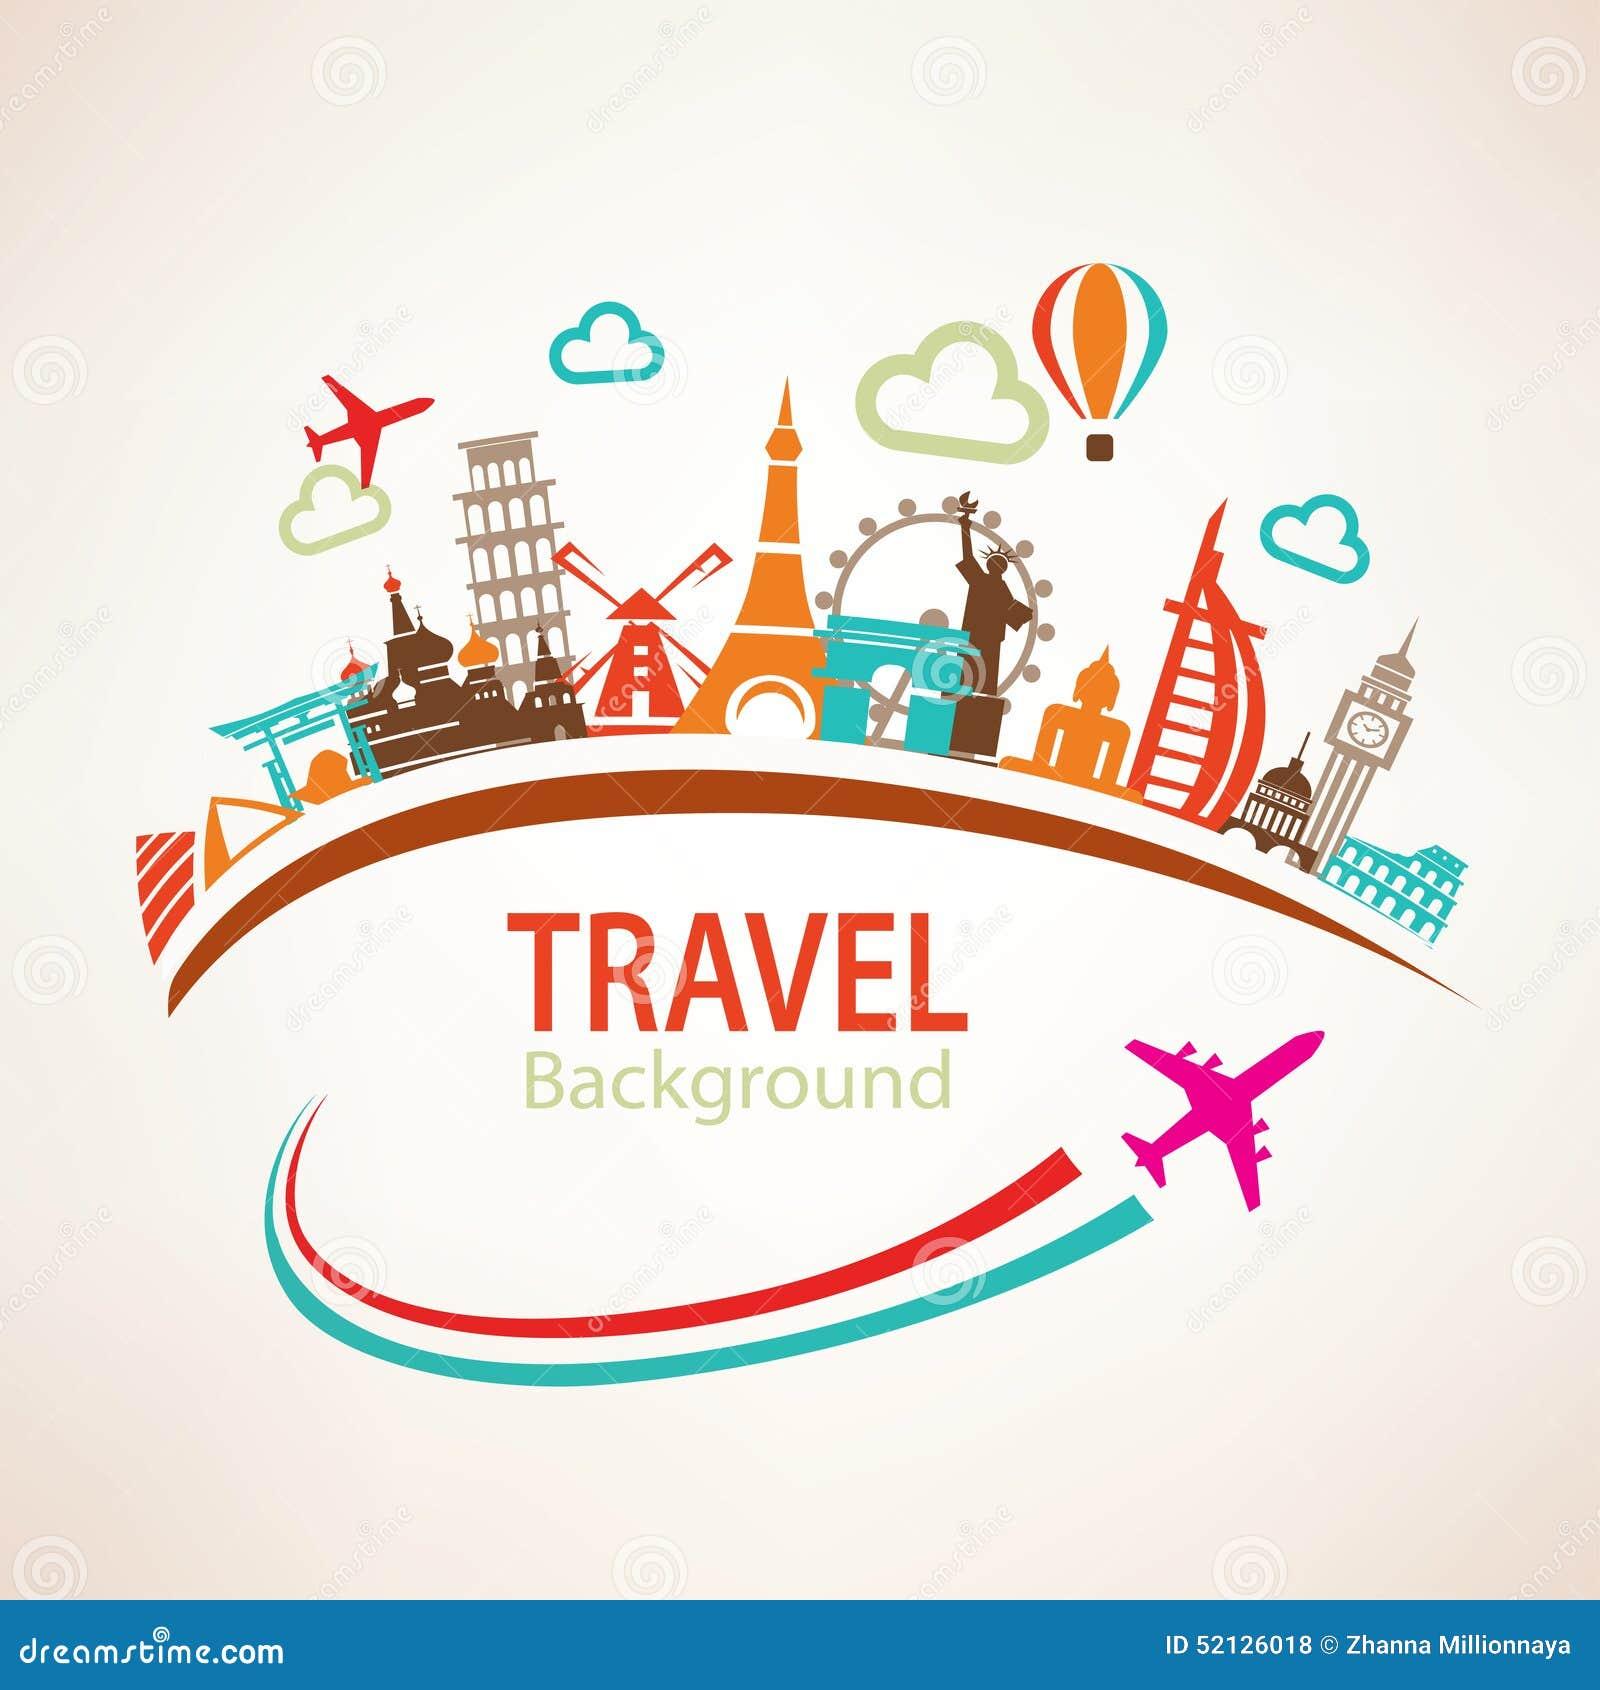 Skyline Travel Agency